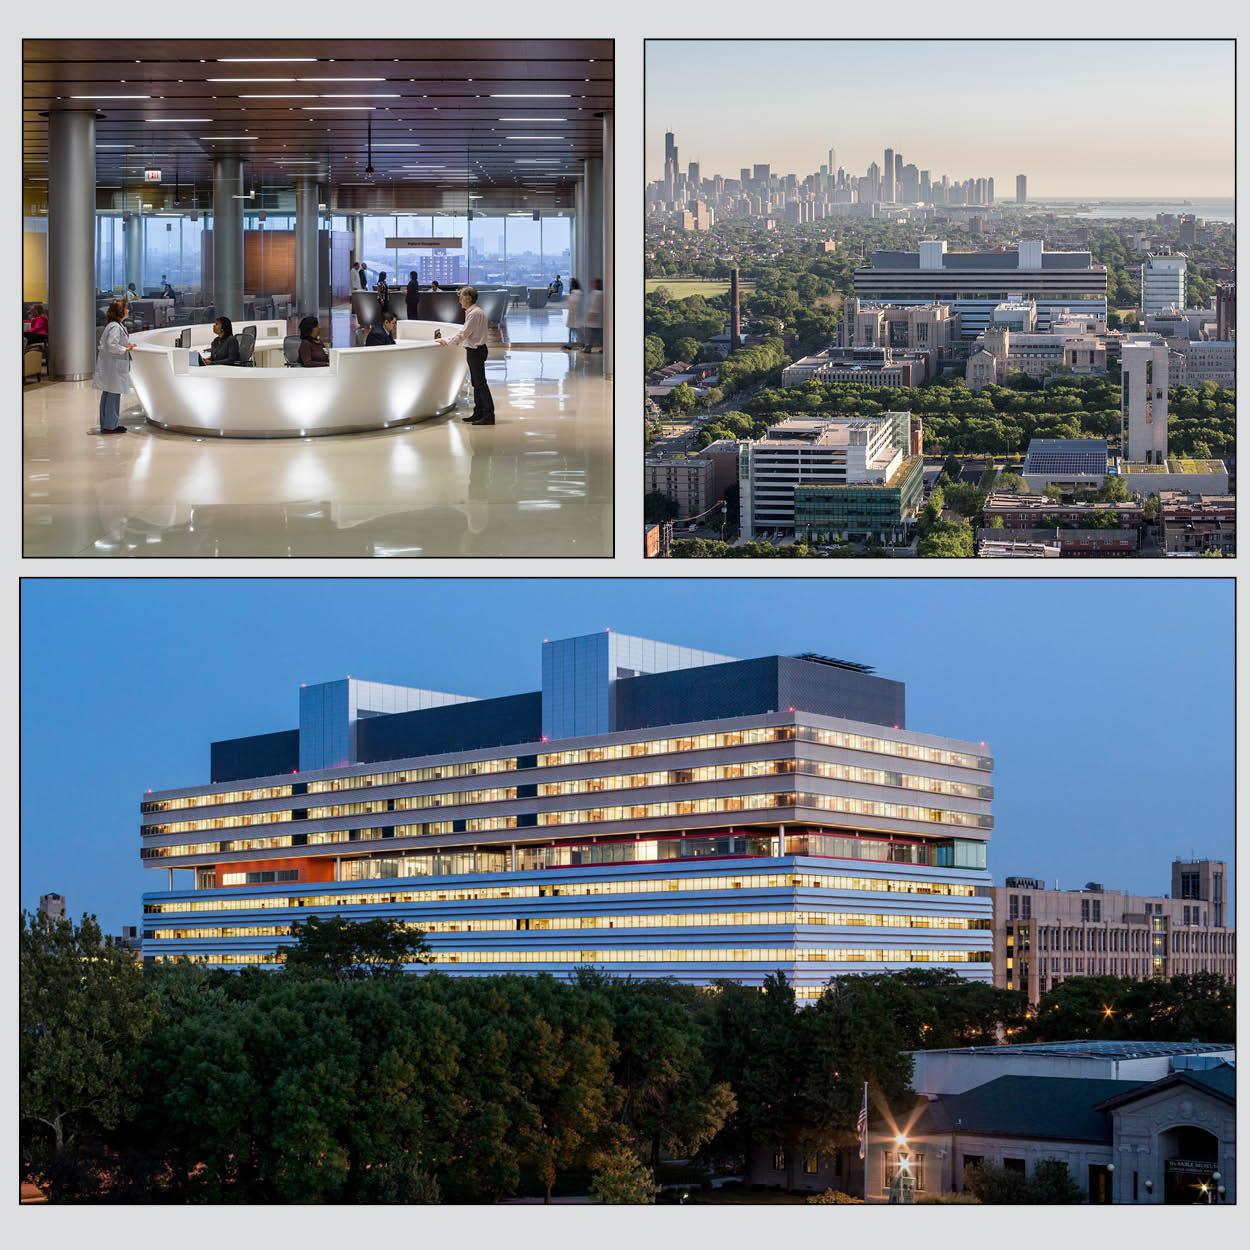 university-of-chicago-medica-center